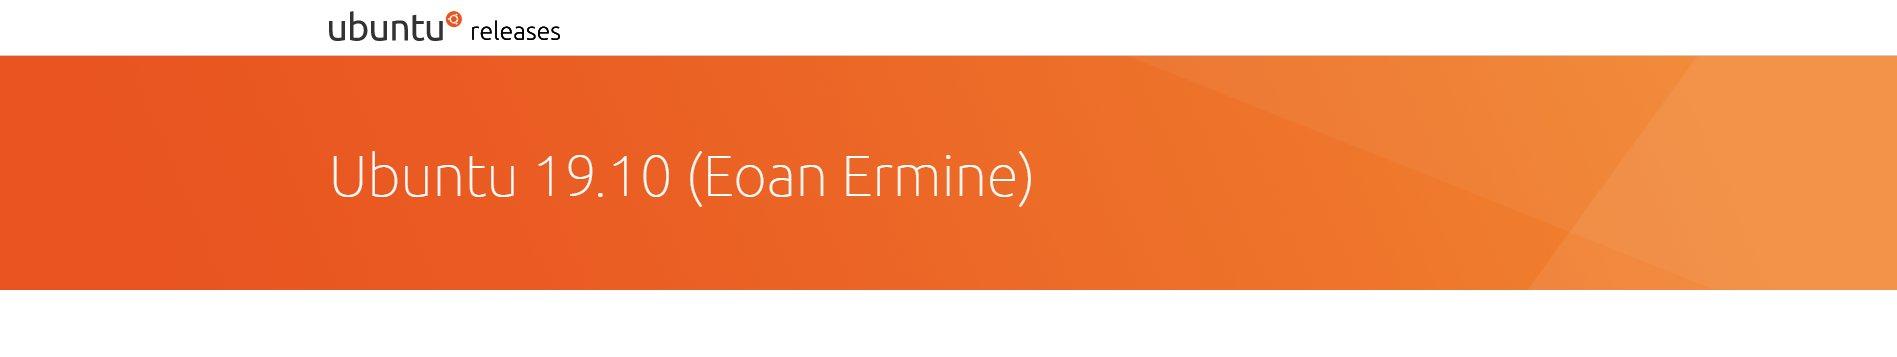 Eoan Ermine Releases